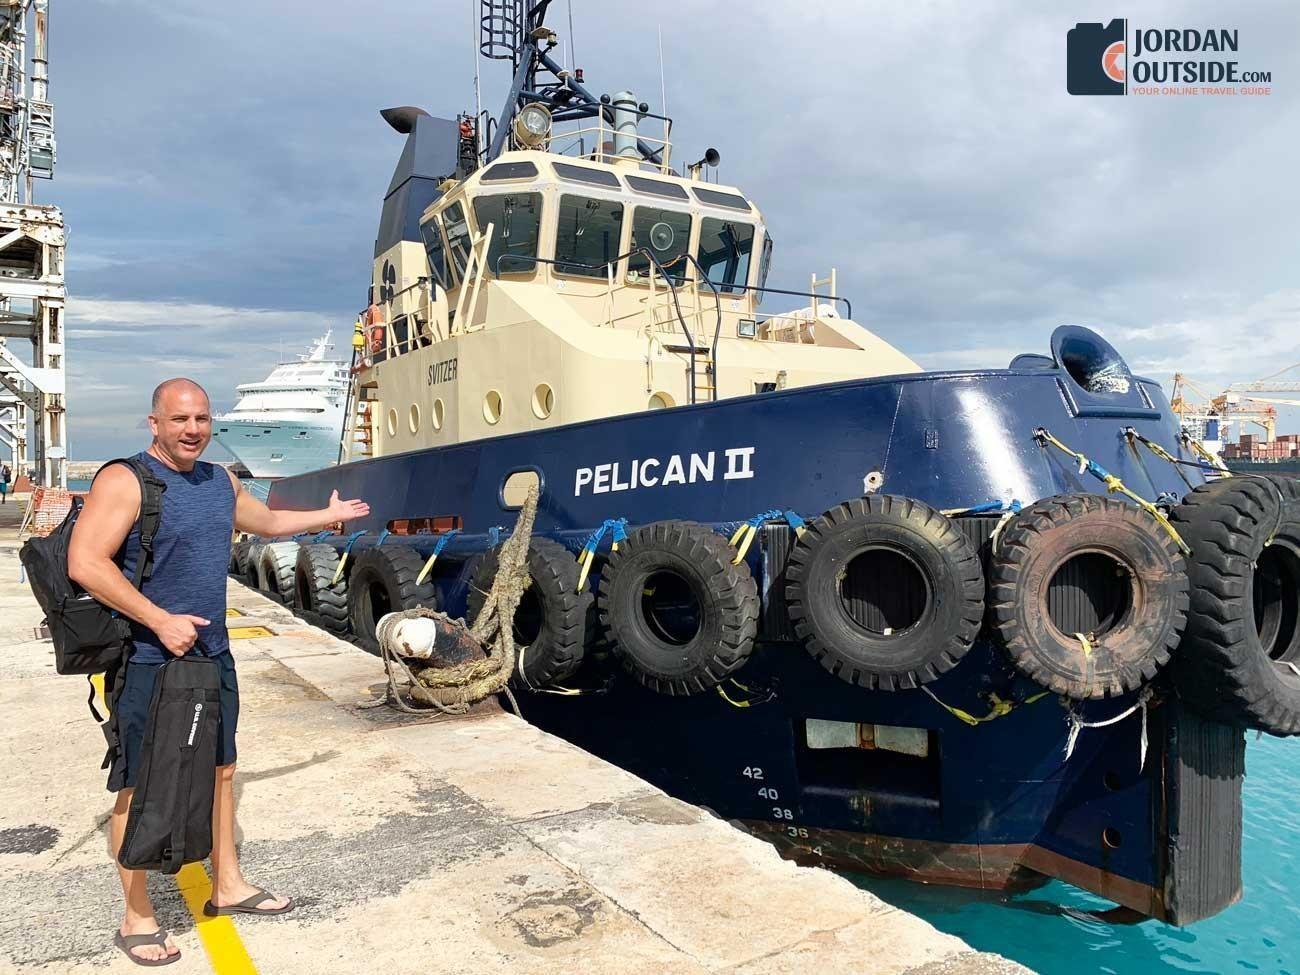 Tugboat in Barbados